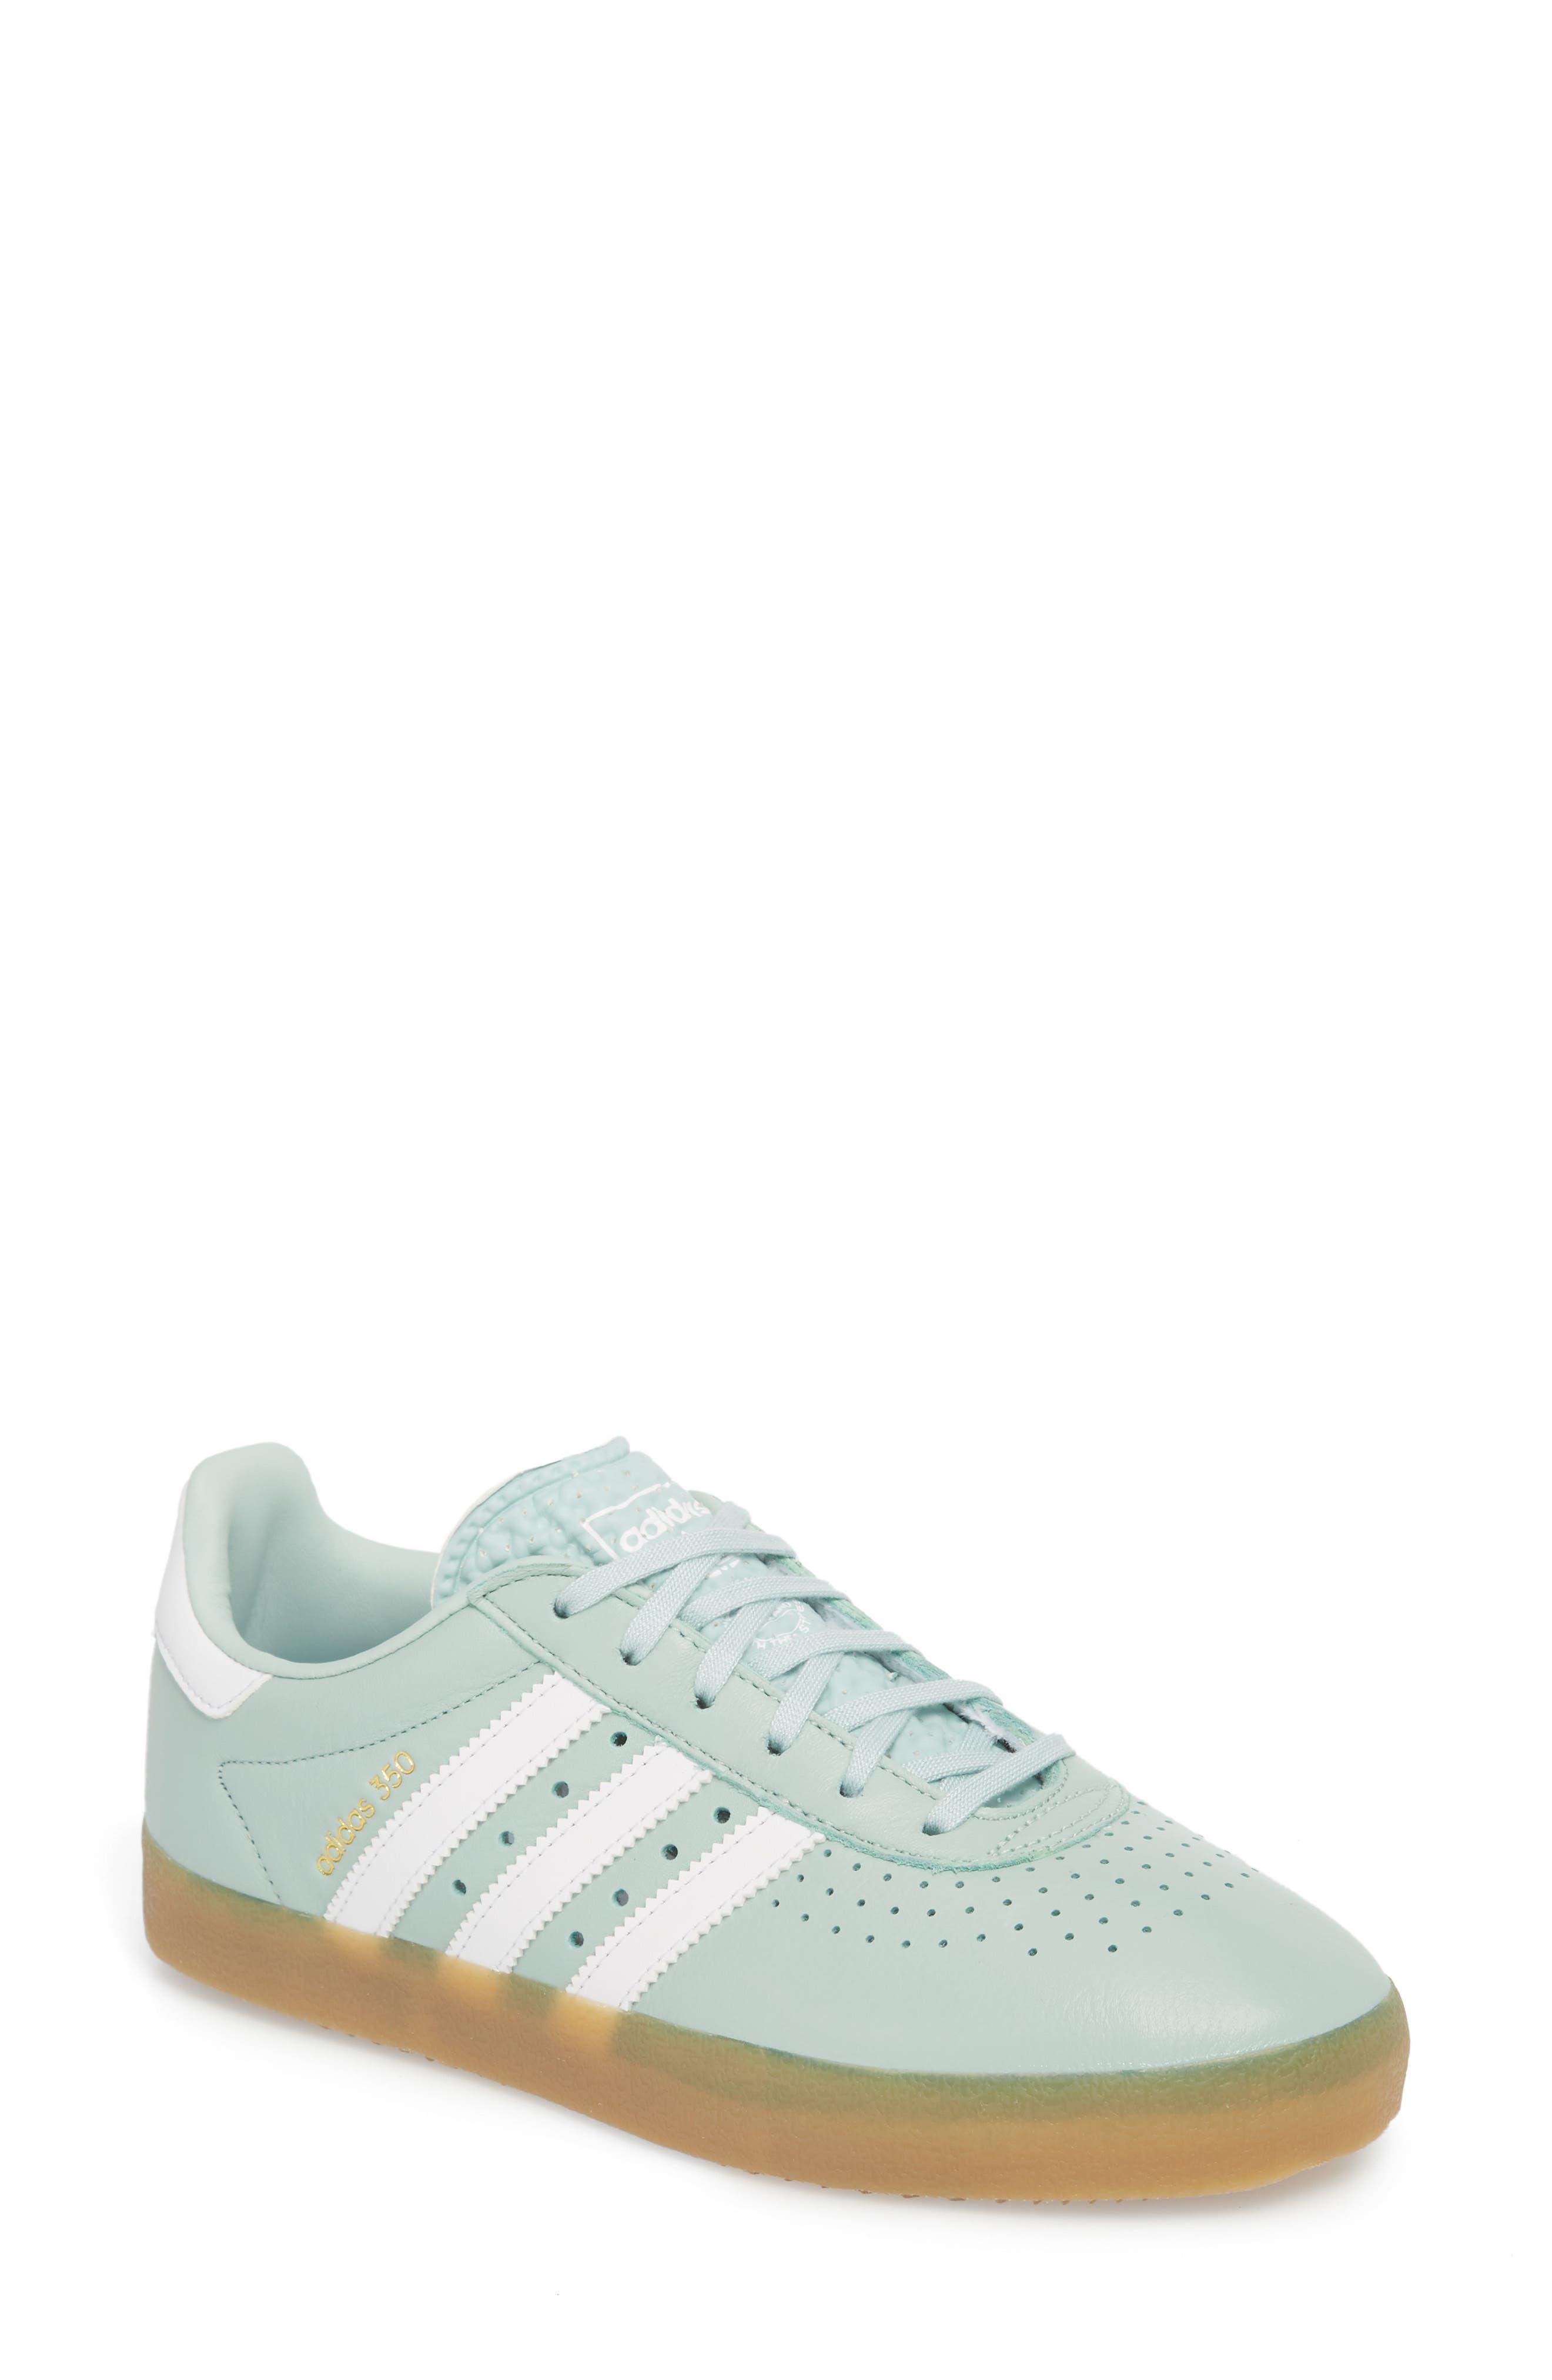 350 Sneaker,                             Main thumbnail 1, color,                             Ash Green/ White/ Gum